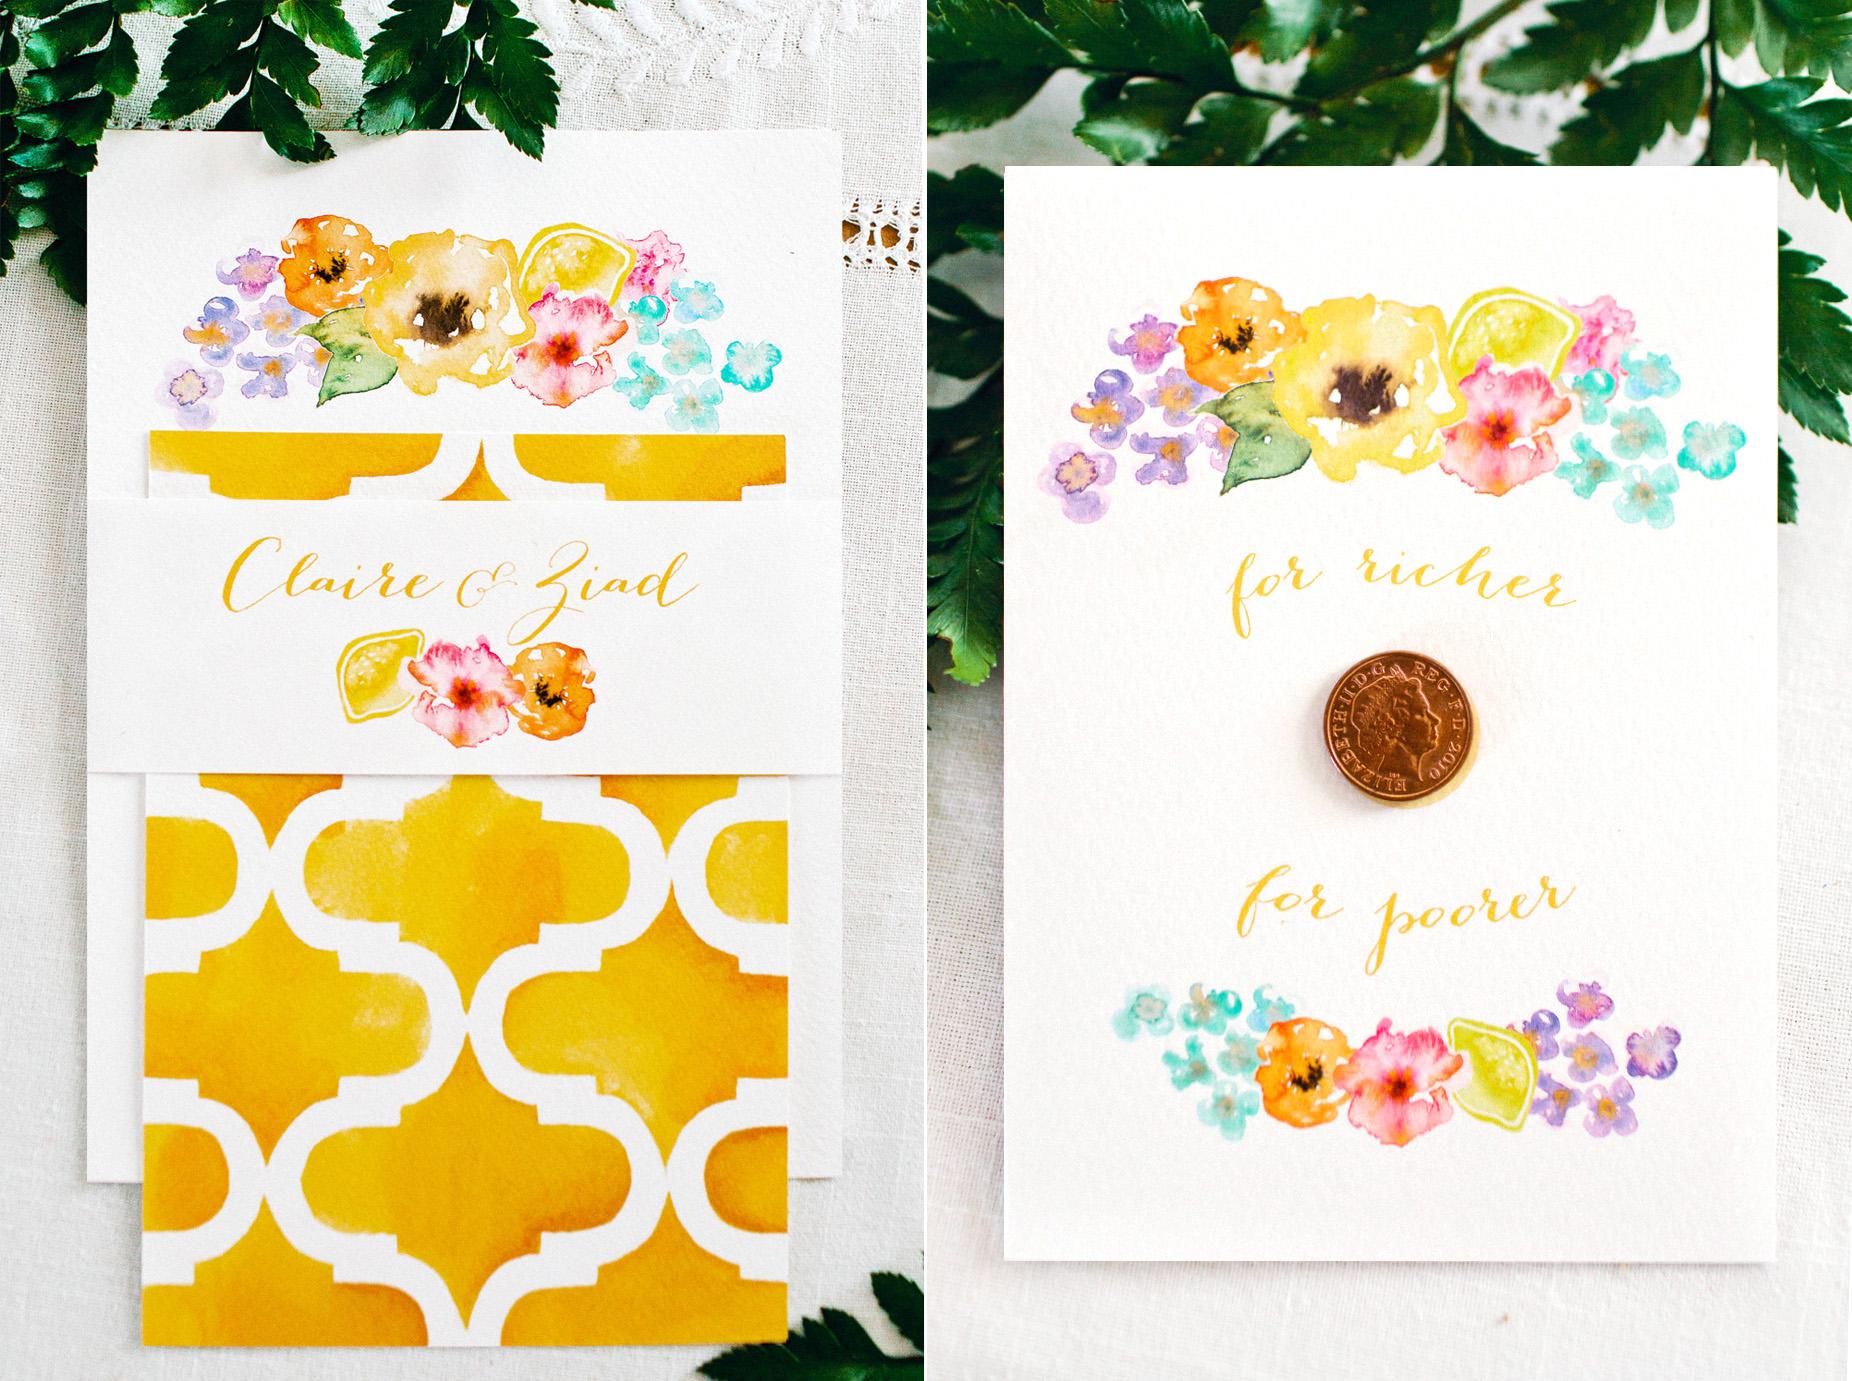 Claire & Ziad - Beautiful Spanish Wedding, Real Wedding - 8 - Pingle Pie.jpg